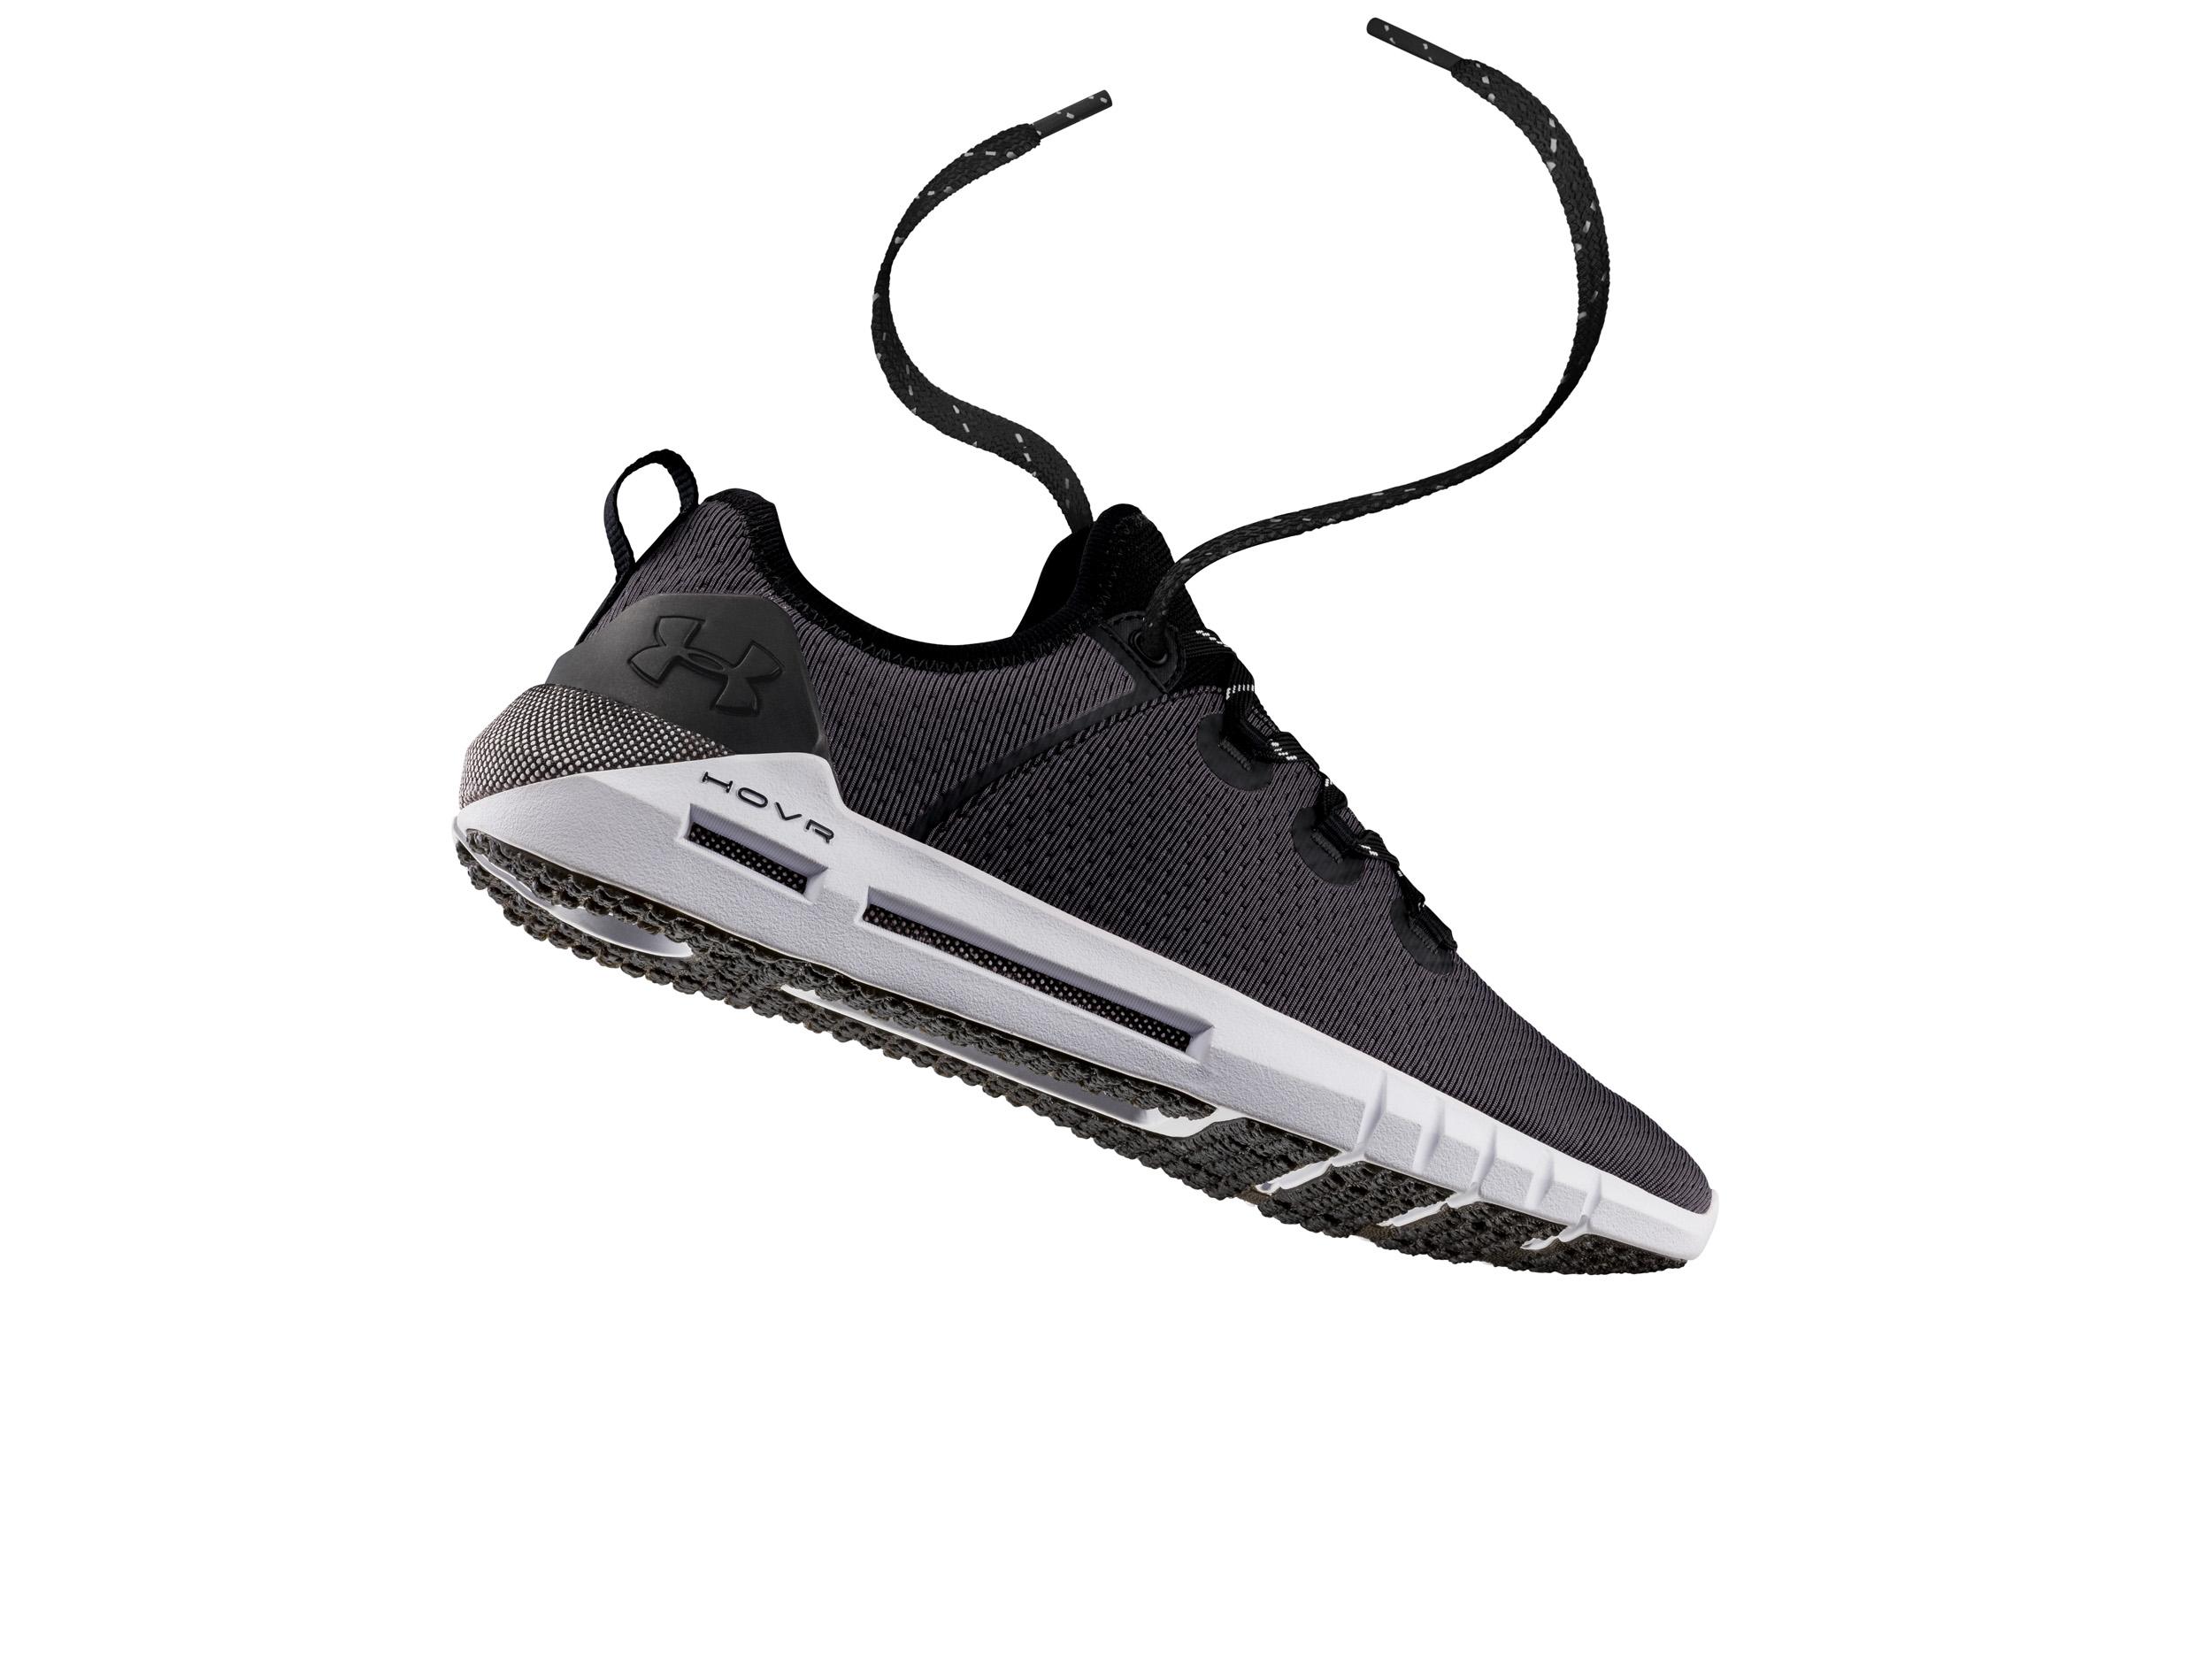 designer fashion 36e59 50803 Under Armour Introduces the HOVR SLK, a Lifestyle Shoe ...